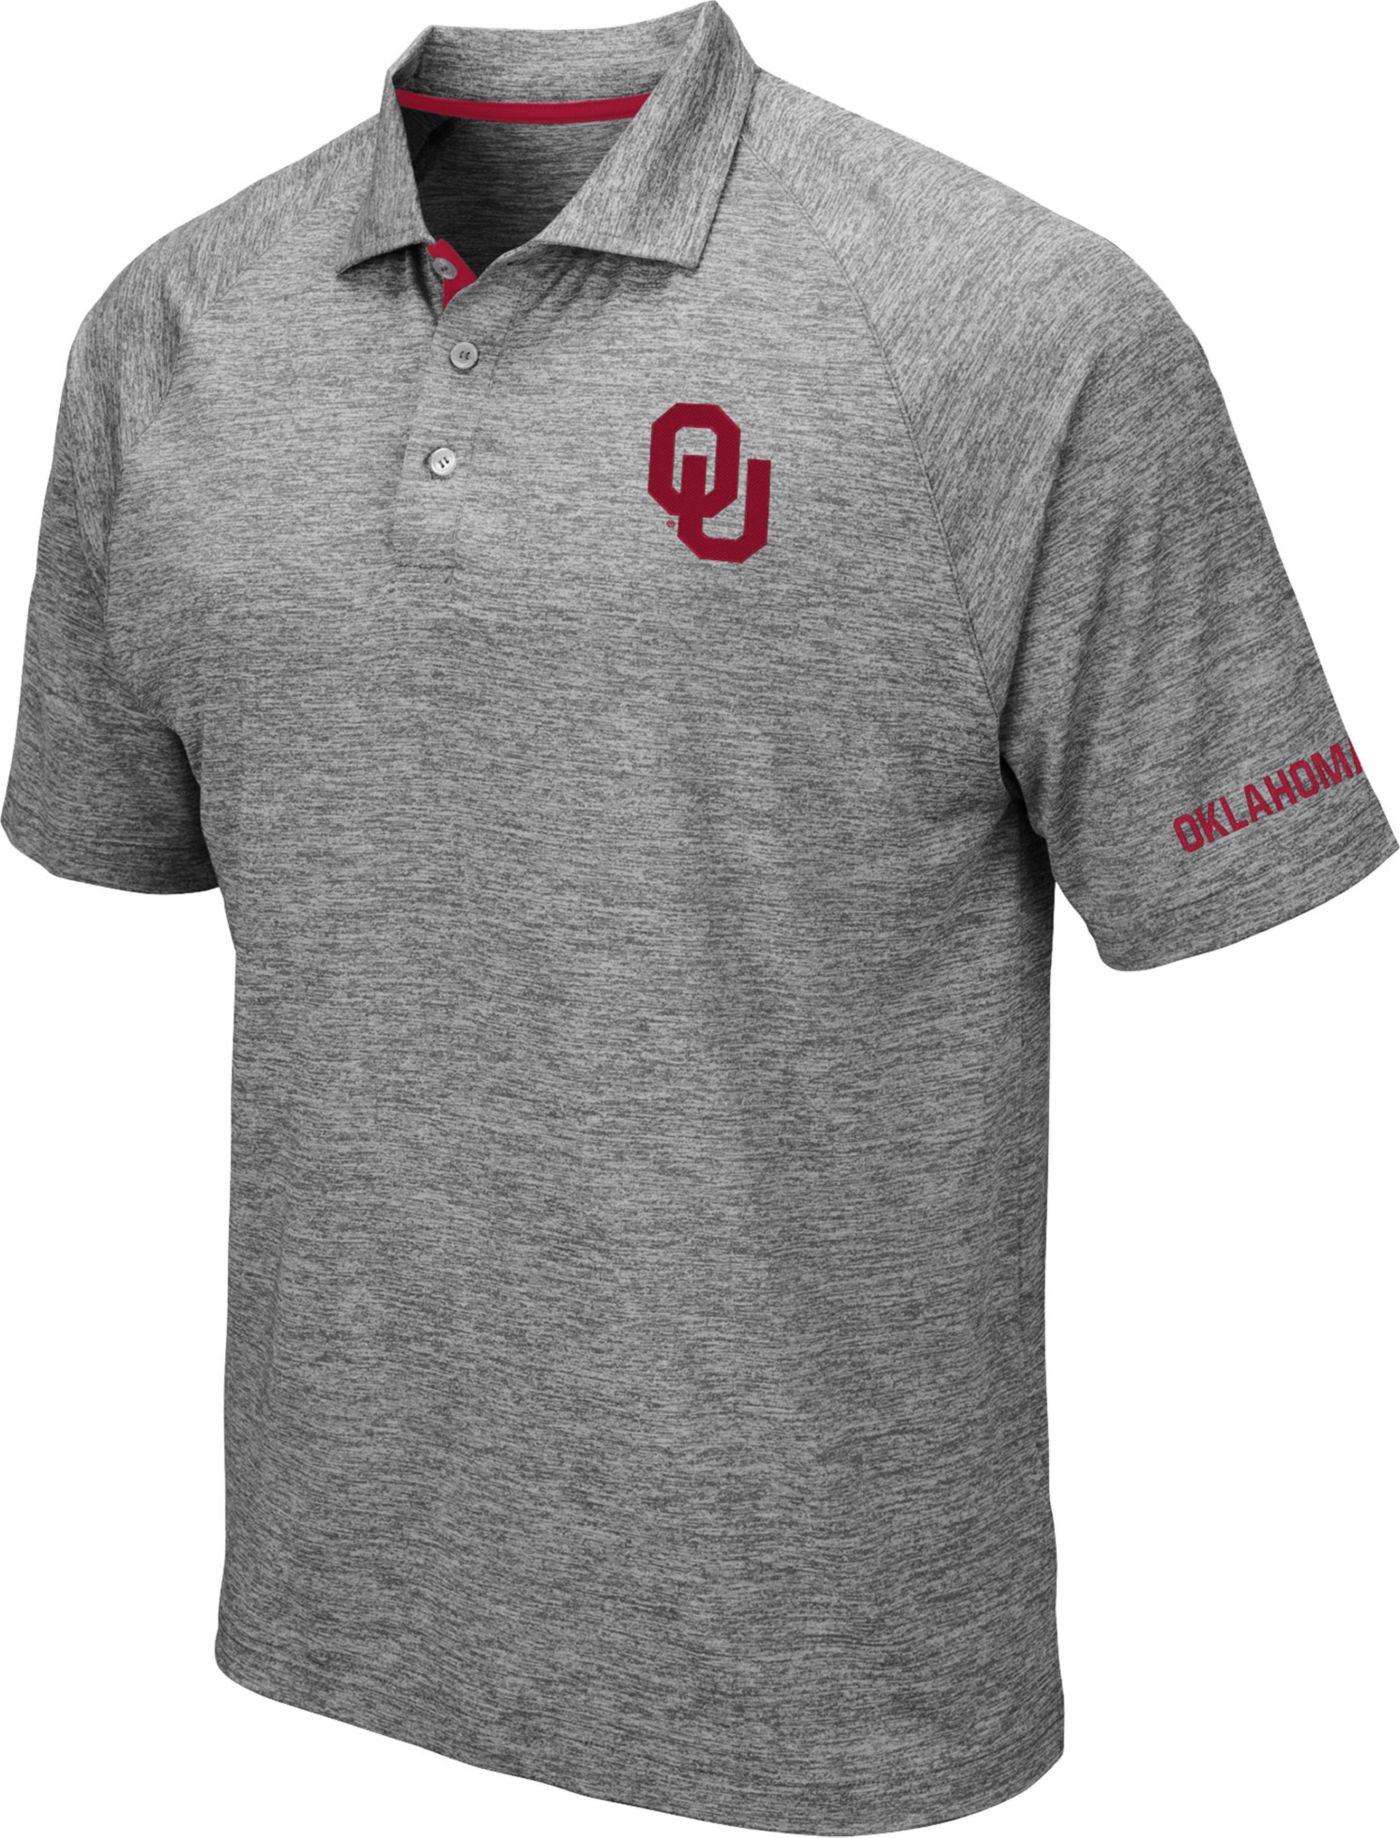 Colosseum Men's Oklahoma Sooners Grey Chip Shot Polo